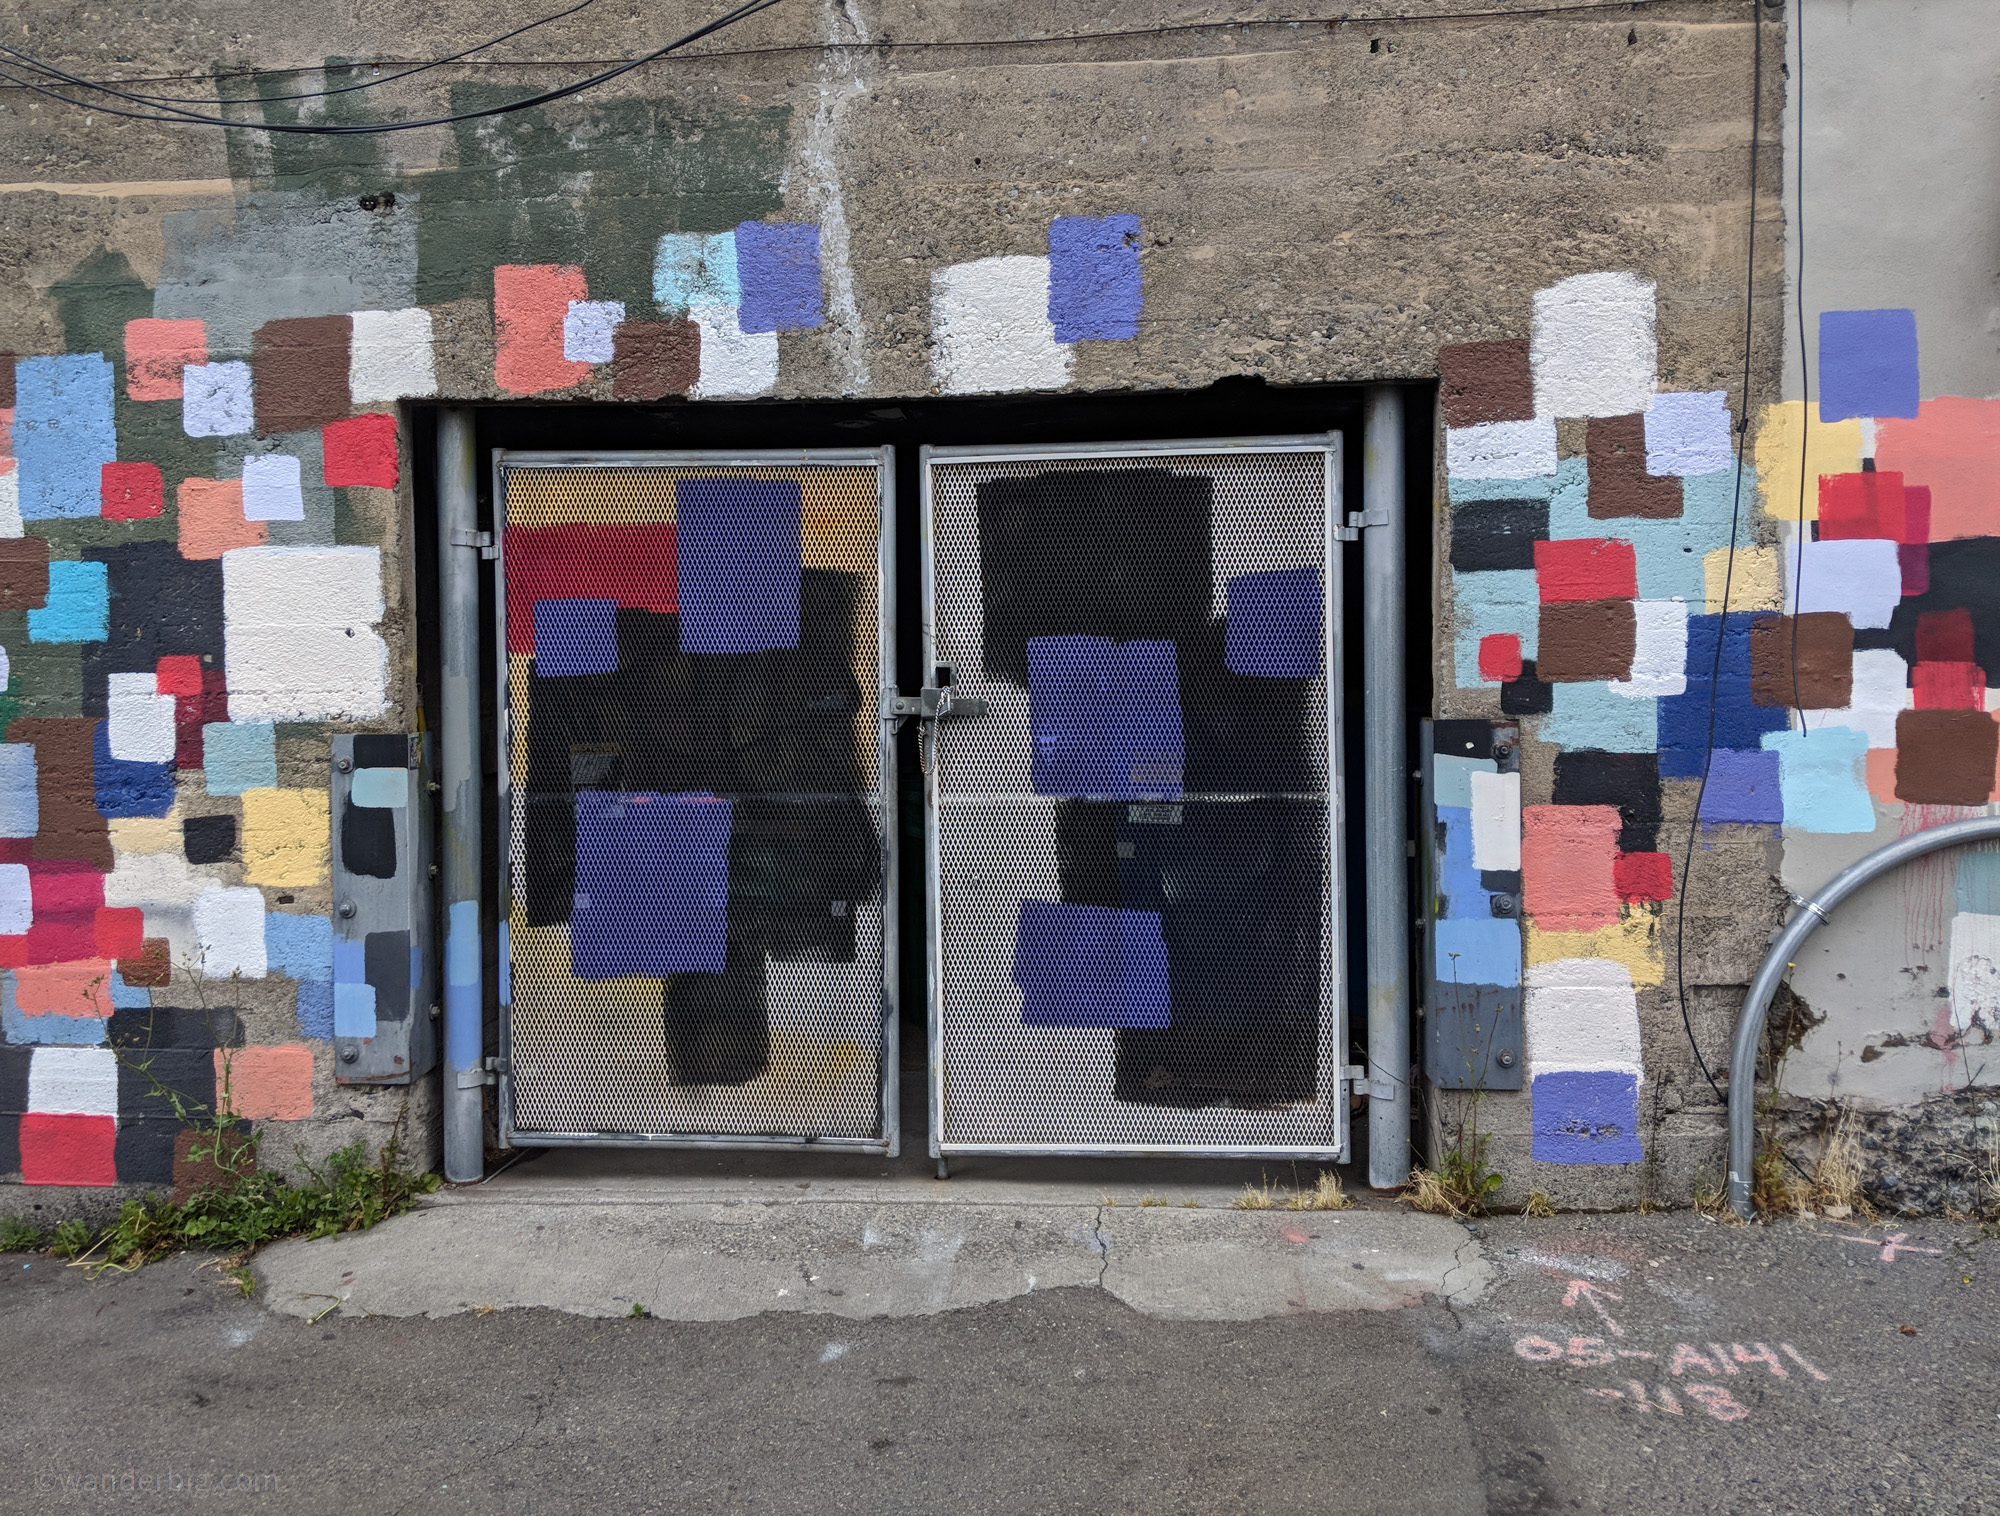 Wb seattle murals 05